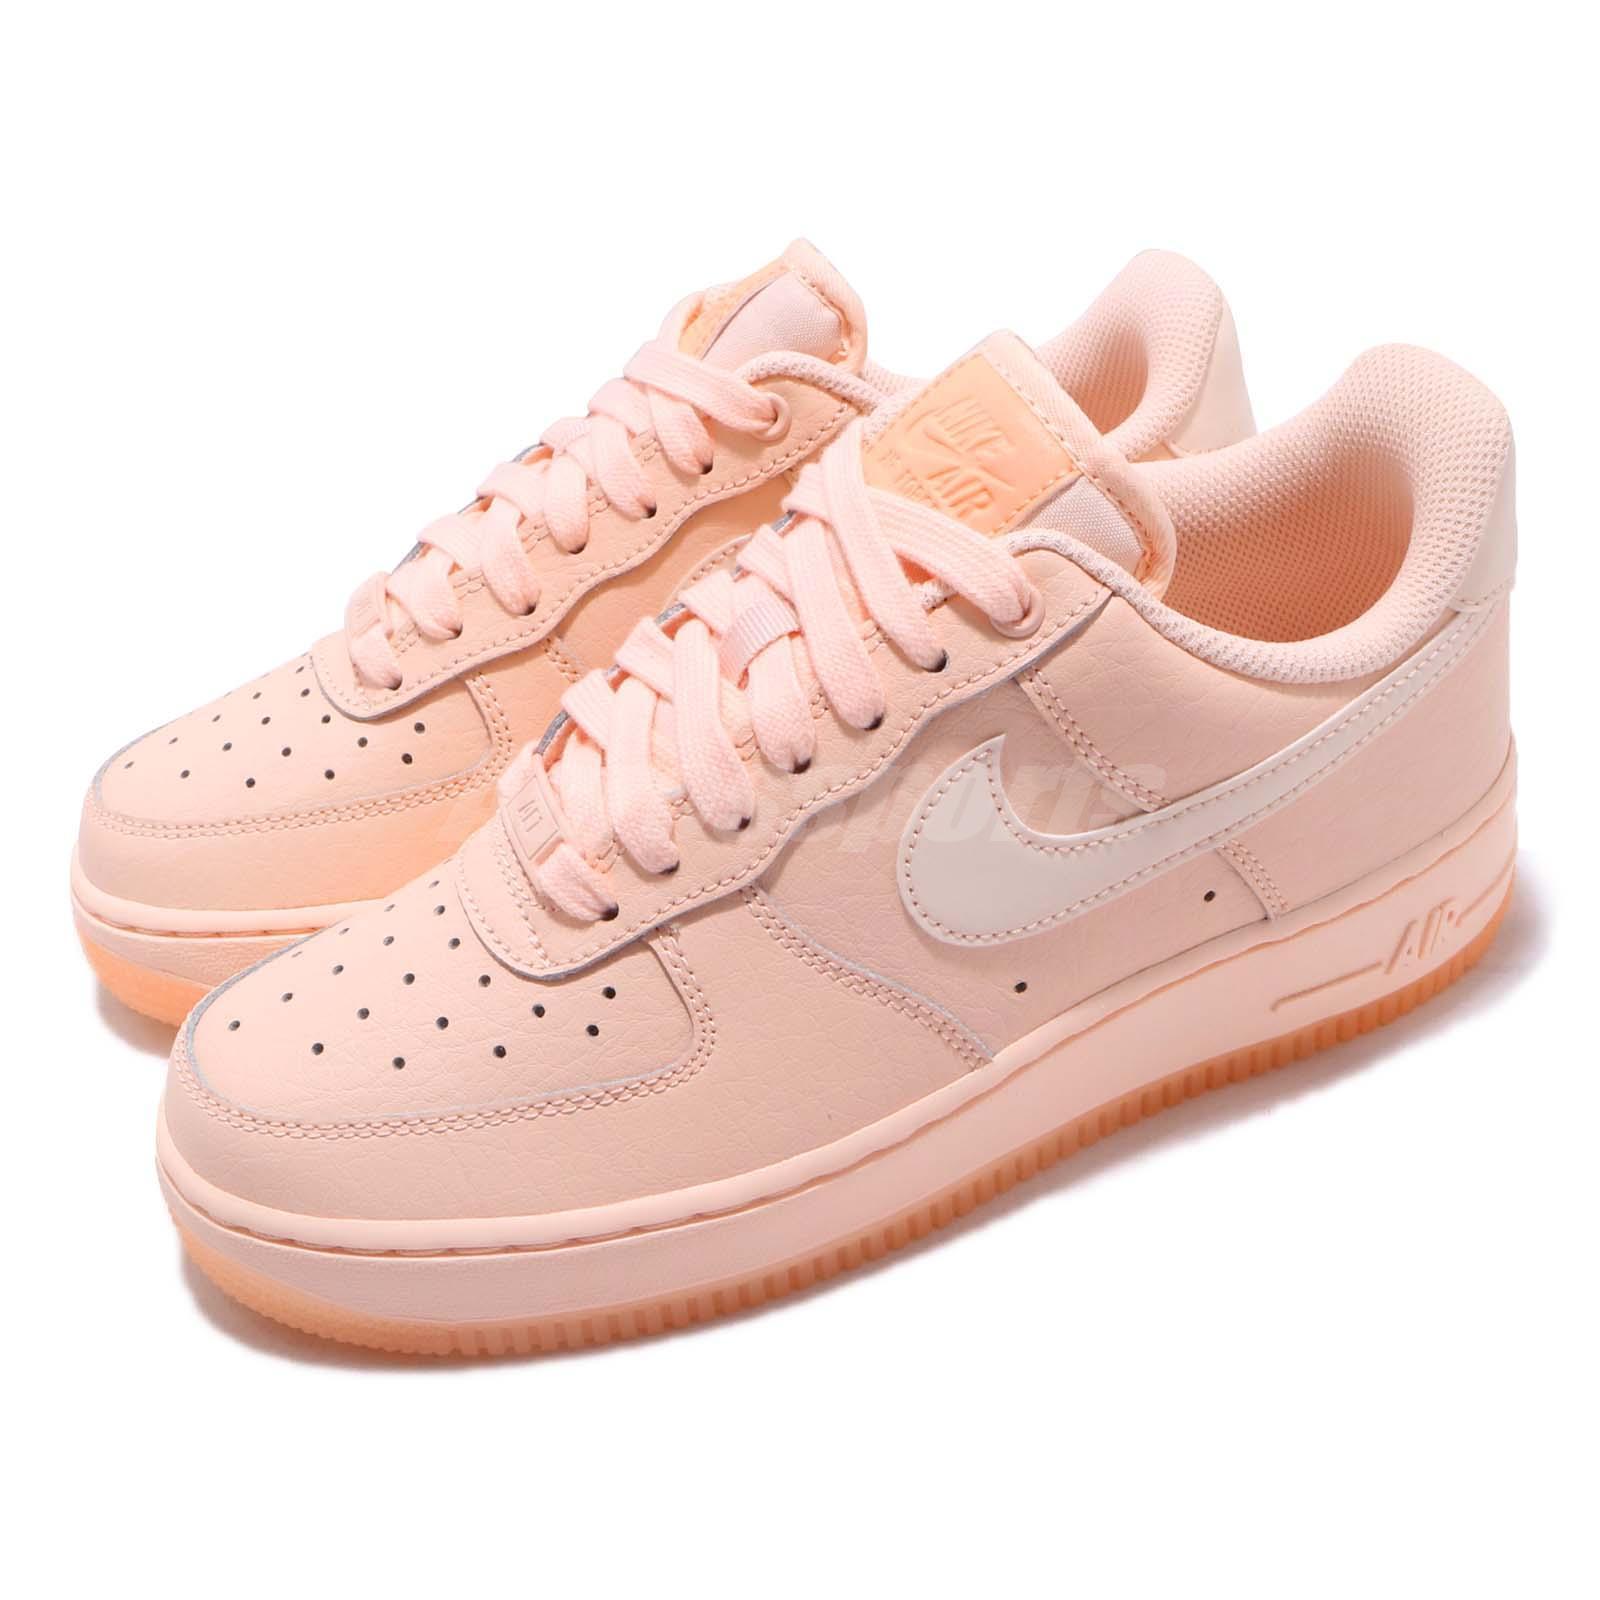 best website 08e40 e6ed3 Details about Nike Wmns Air Force 1 07 Essential Crimson Tint Reflect Womens  Shoes AO2132-800